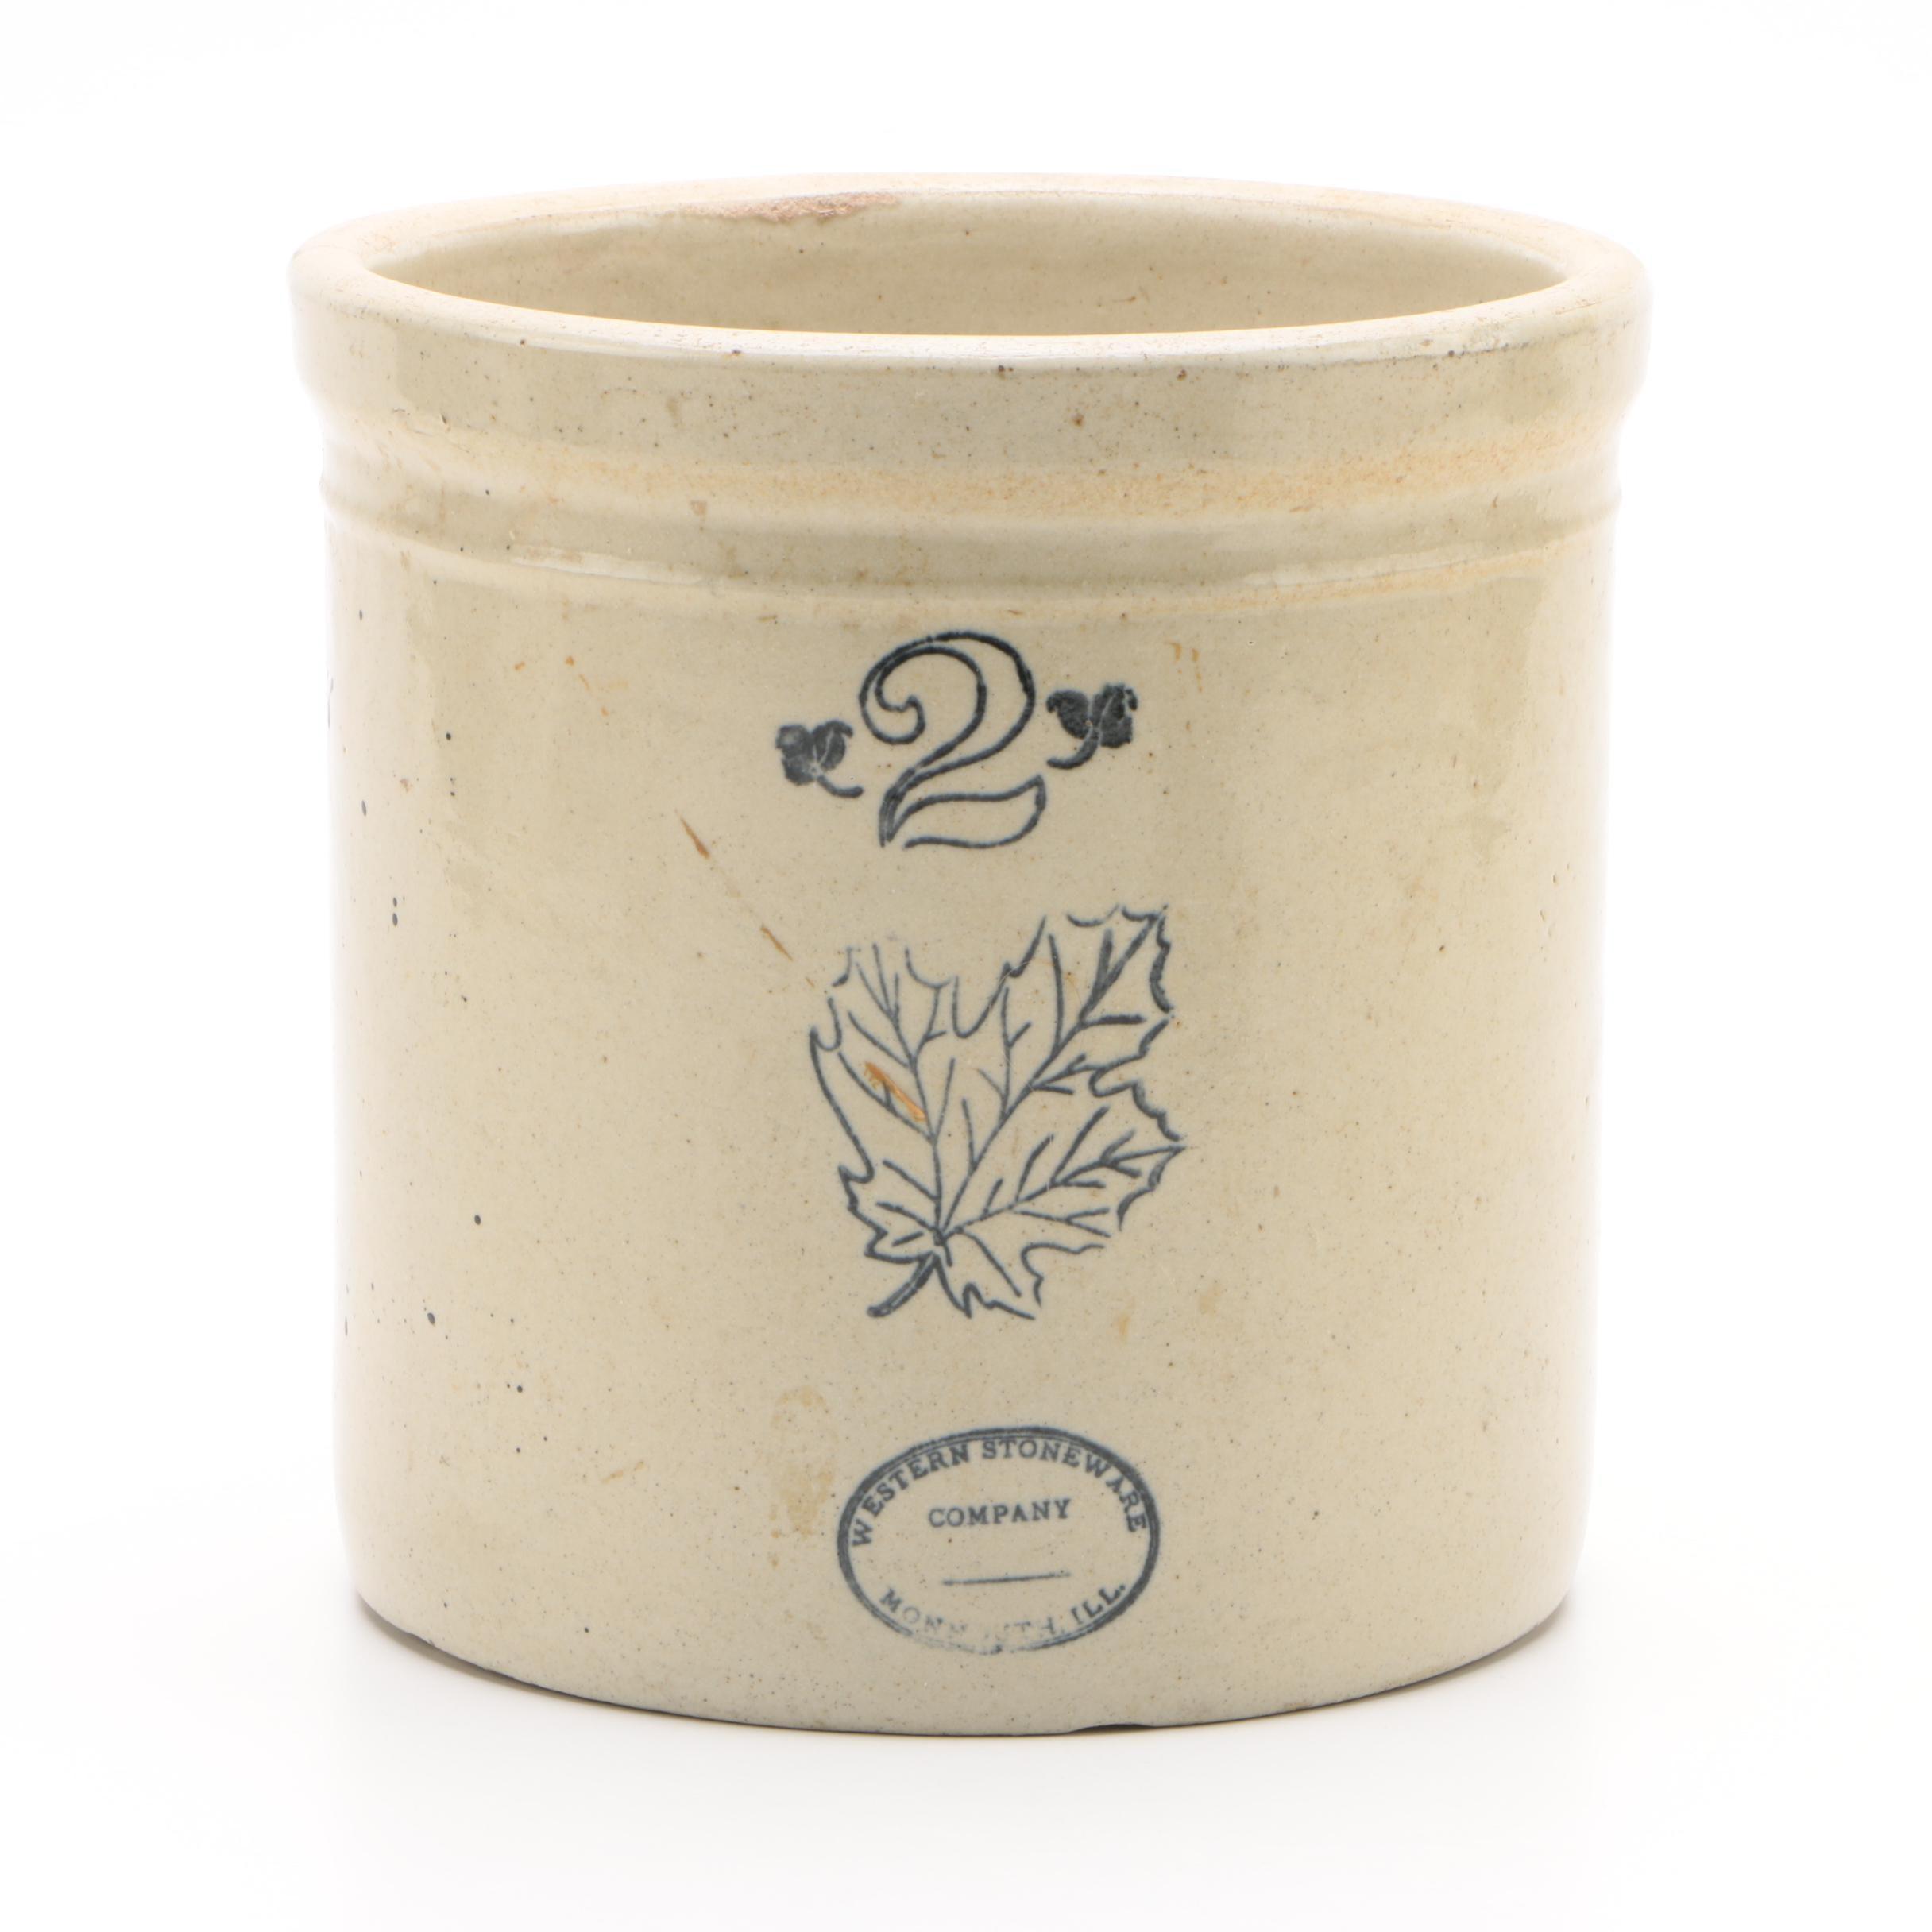 Vintage Western Stoneware Company Two-Gallon Salt Glazed Crock